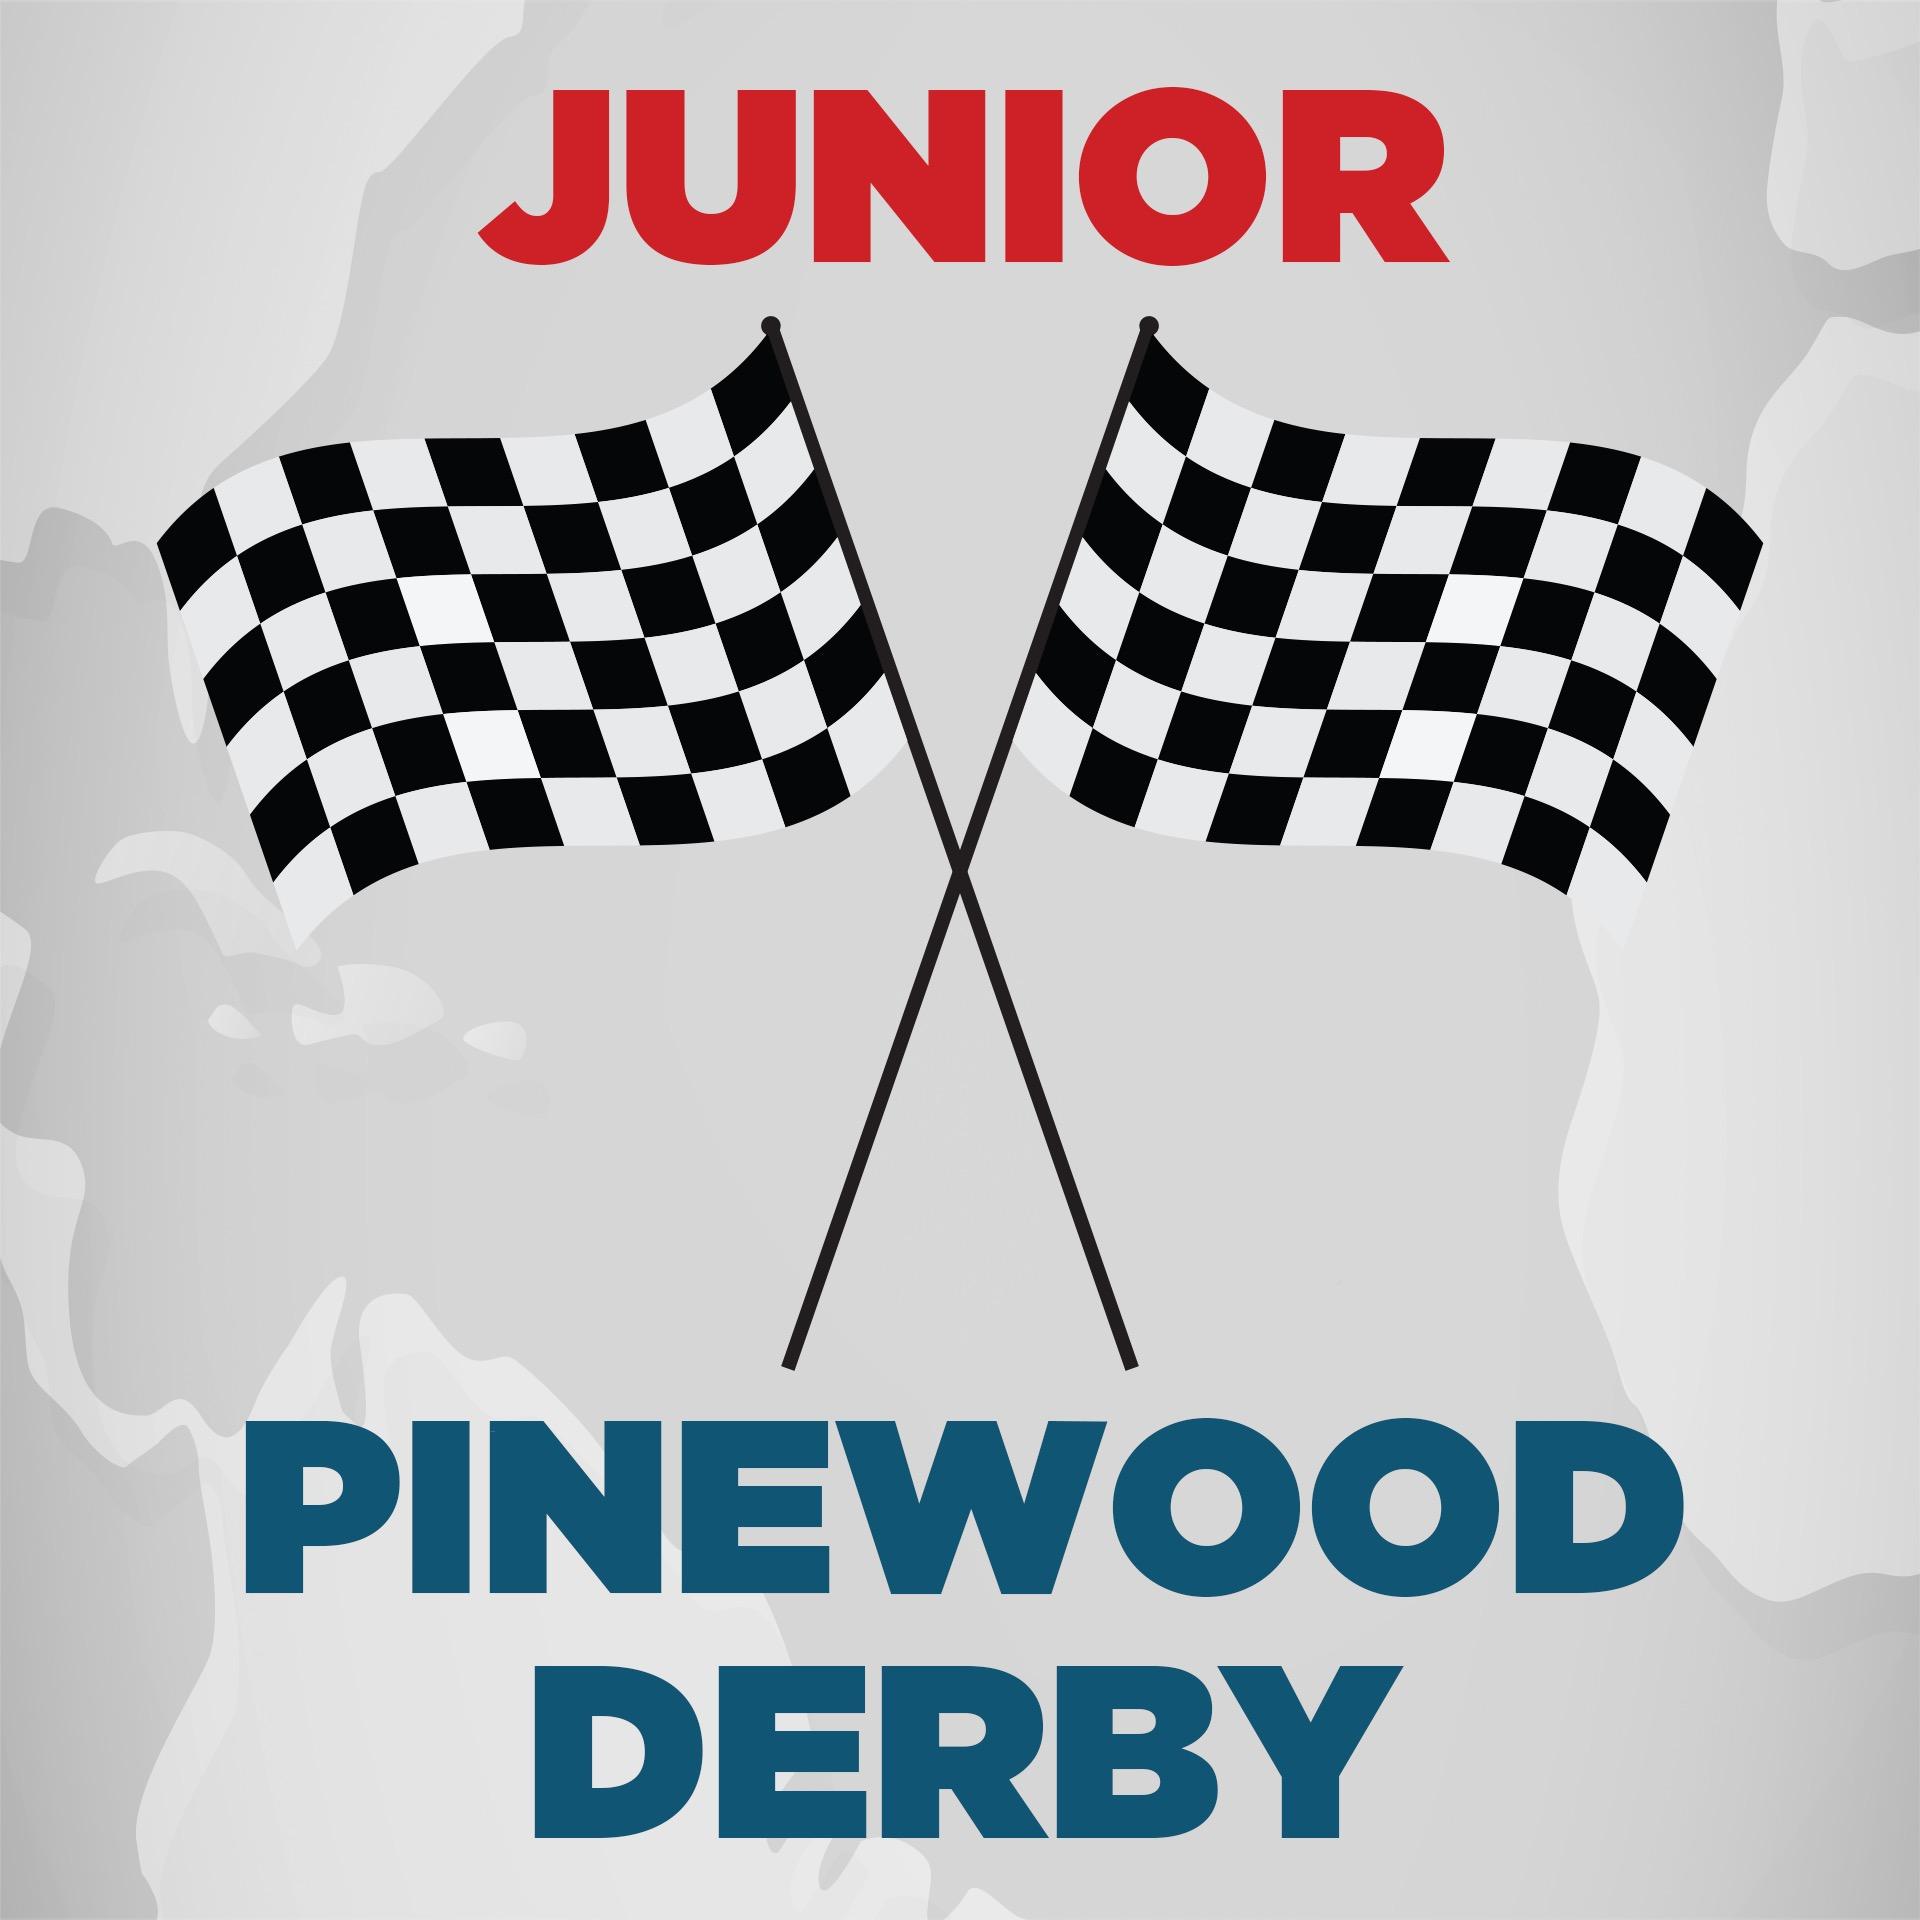 11th Pinewood Derby